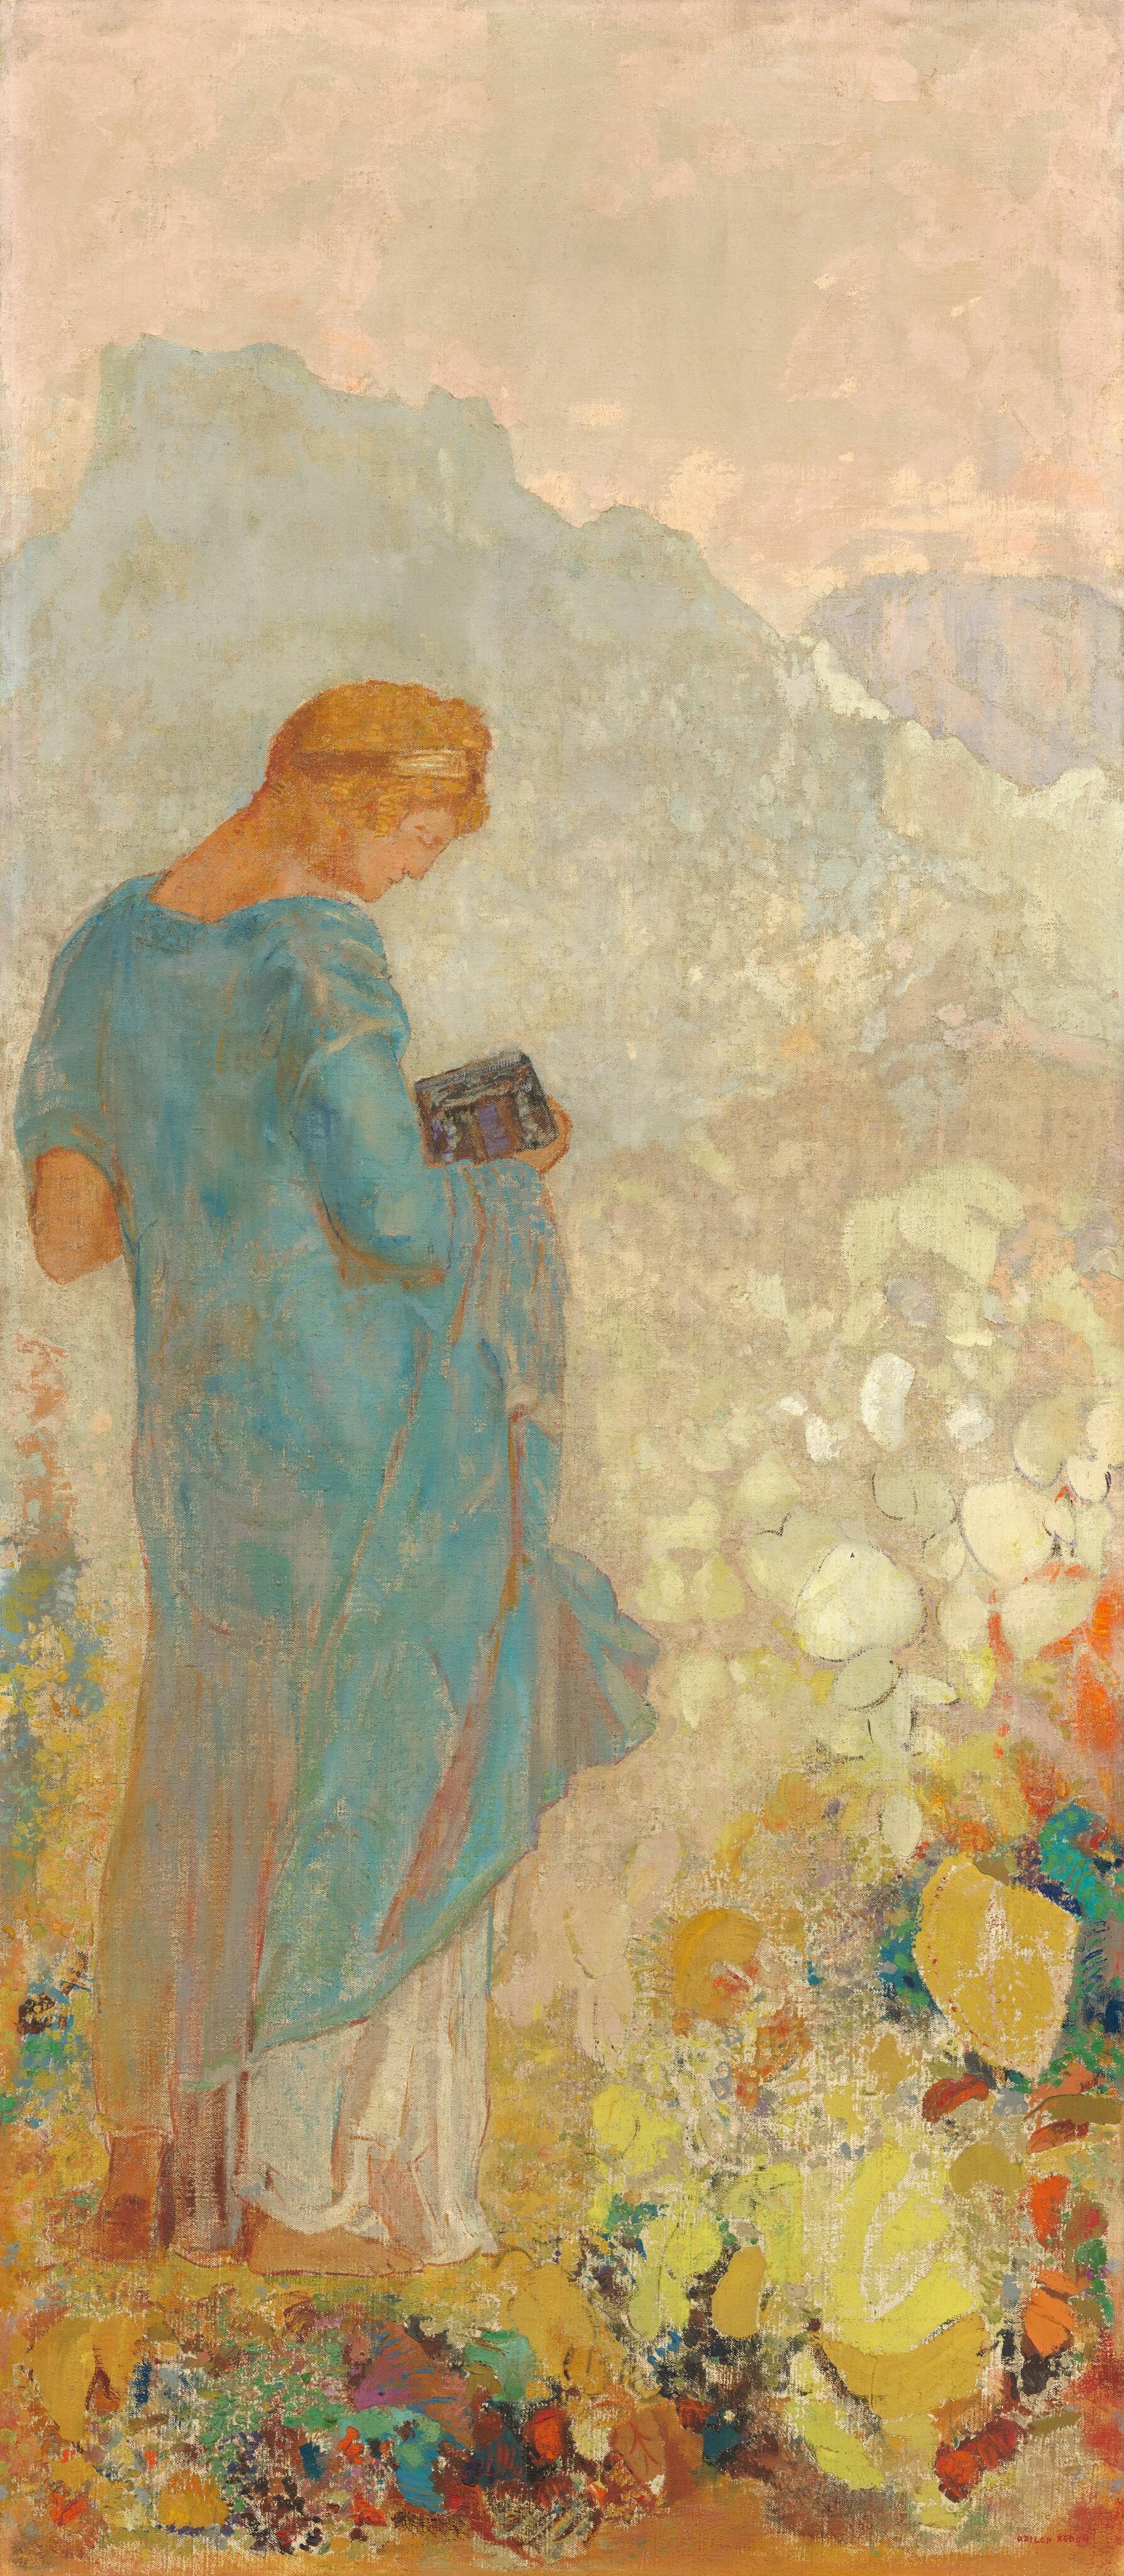 Pandora, 1910/1912, by Odilon Redon